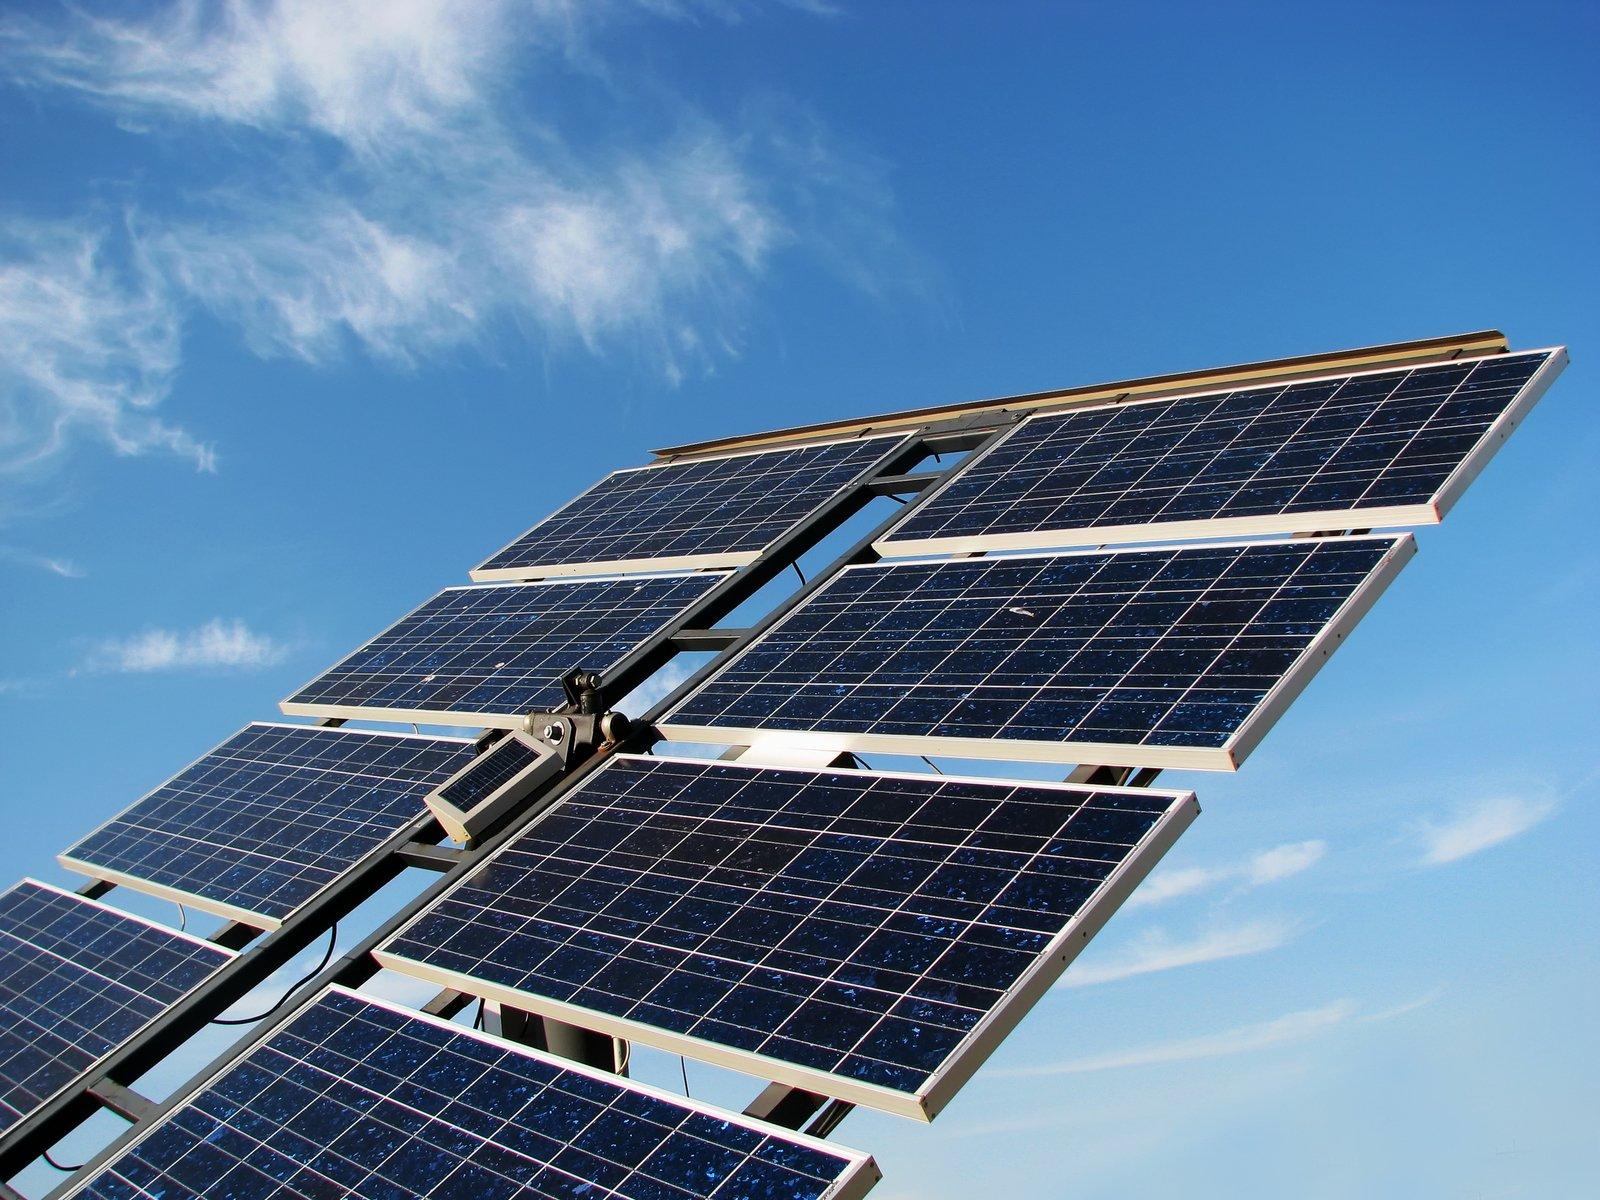 solar-panel-in-the-field-3-1415243.jpg